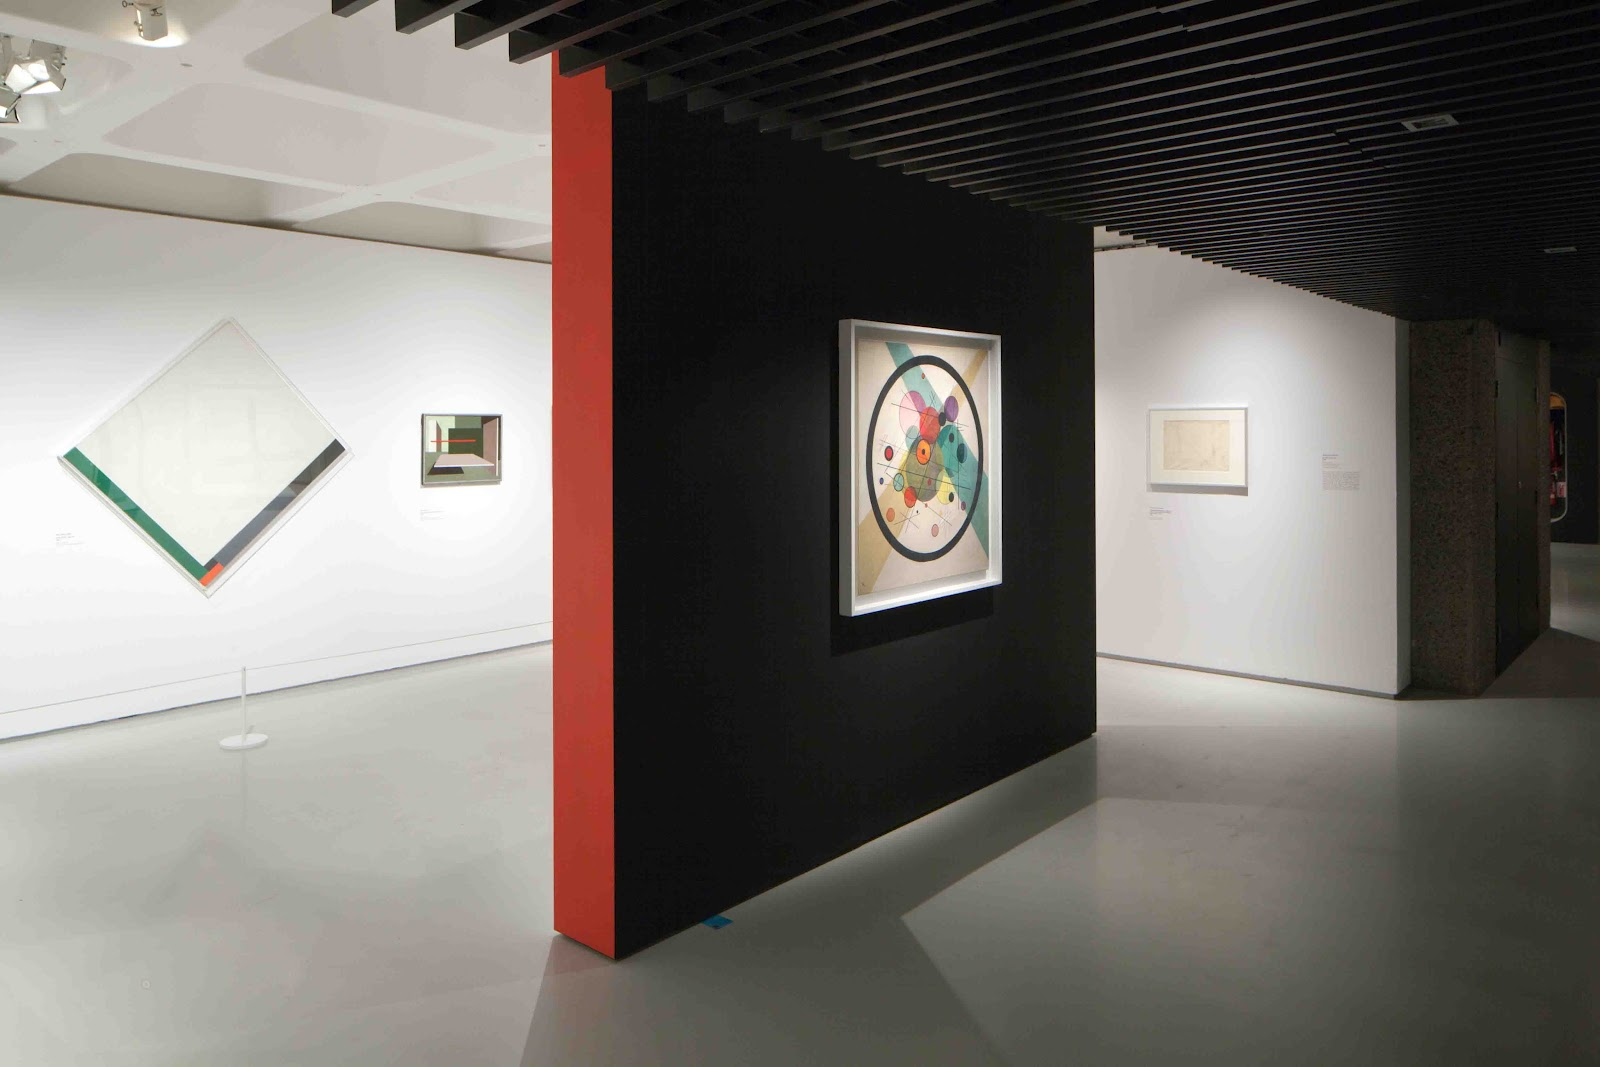 professor whitestick u0026 39 s blog  bauhaus  art as life  barbican art gallery  london